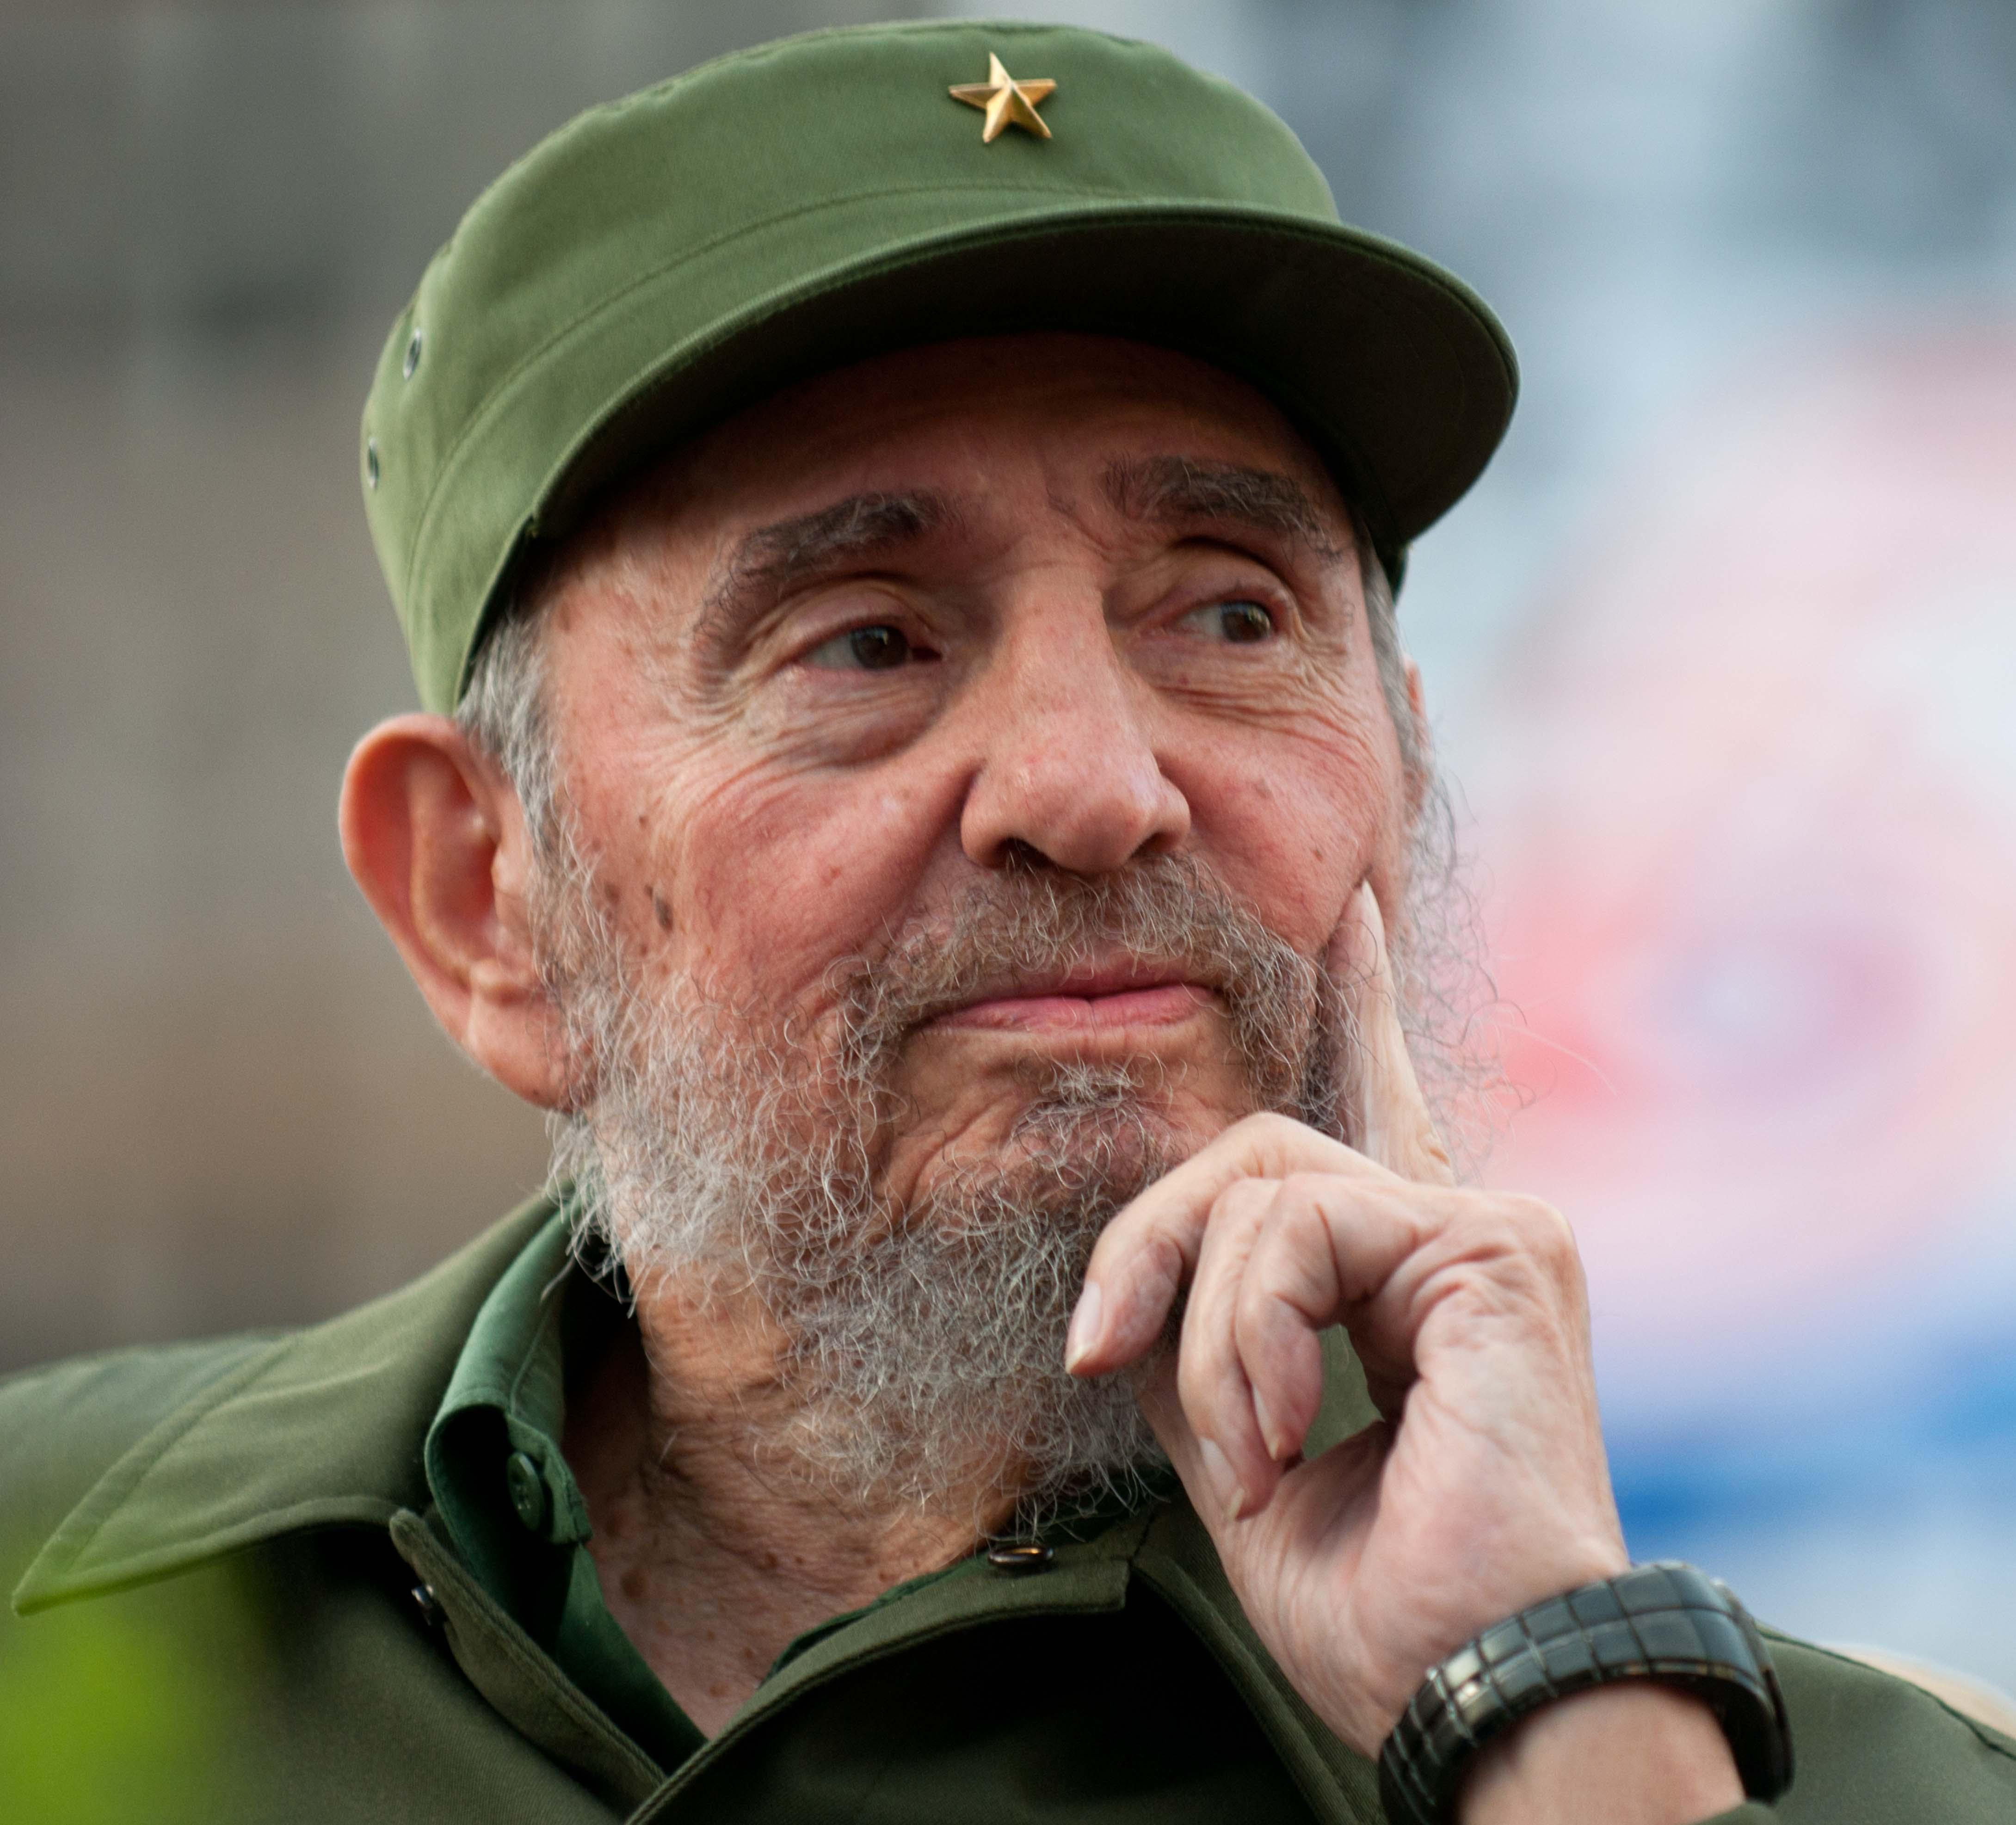 HD Quality Wallpaper | Collection: Men, 4359x3946 Fidel Castro